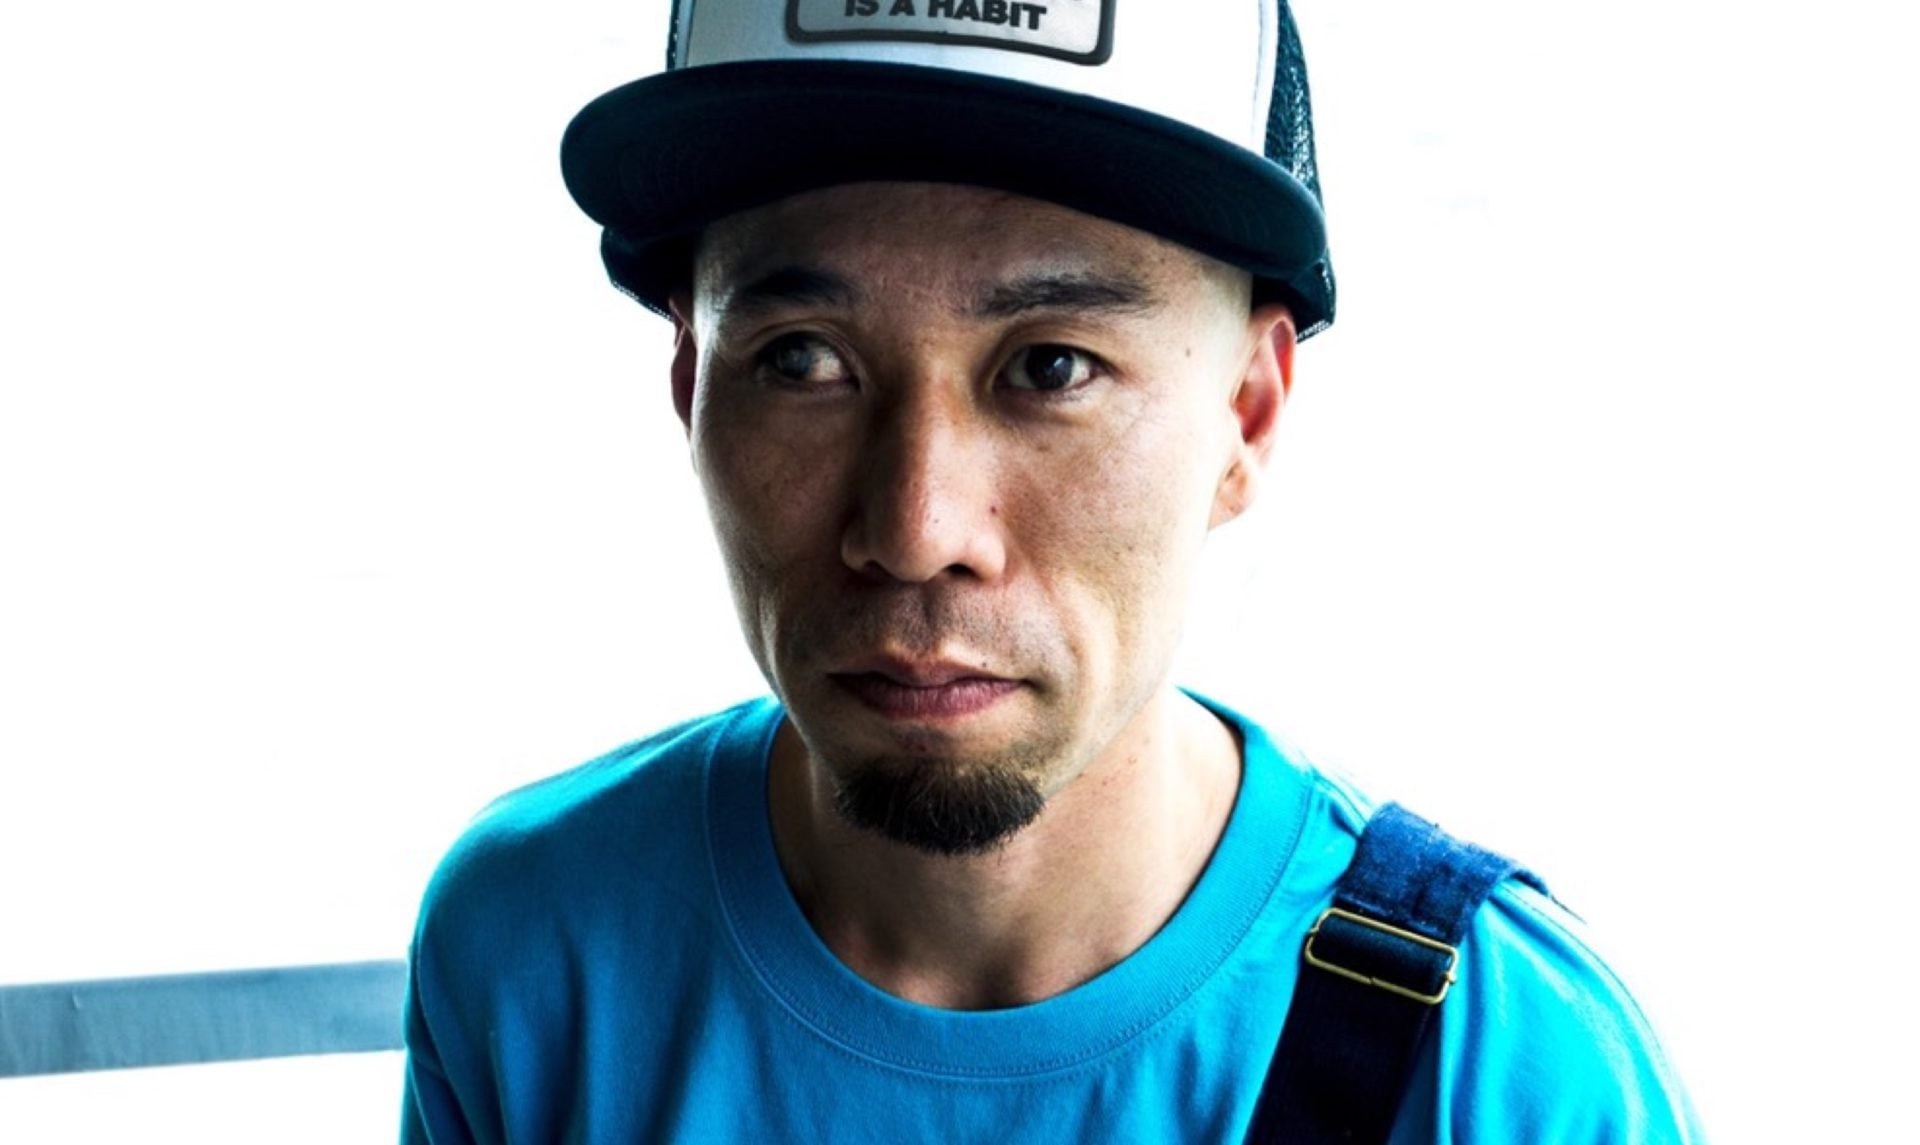 DJ KOCO a.k.a SHIMOKITA